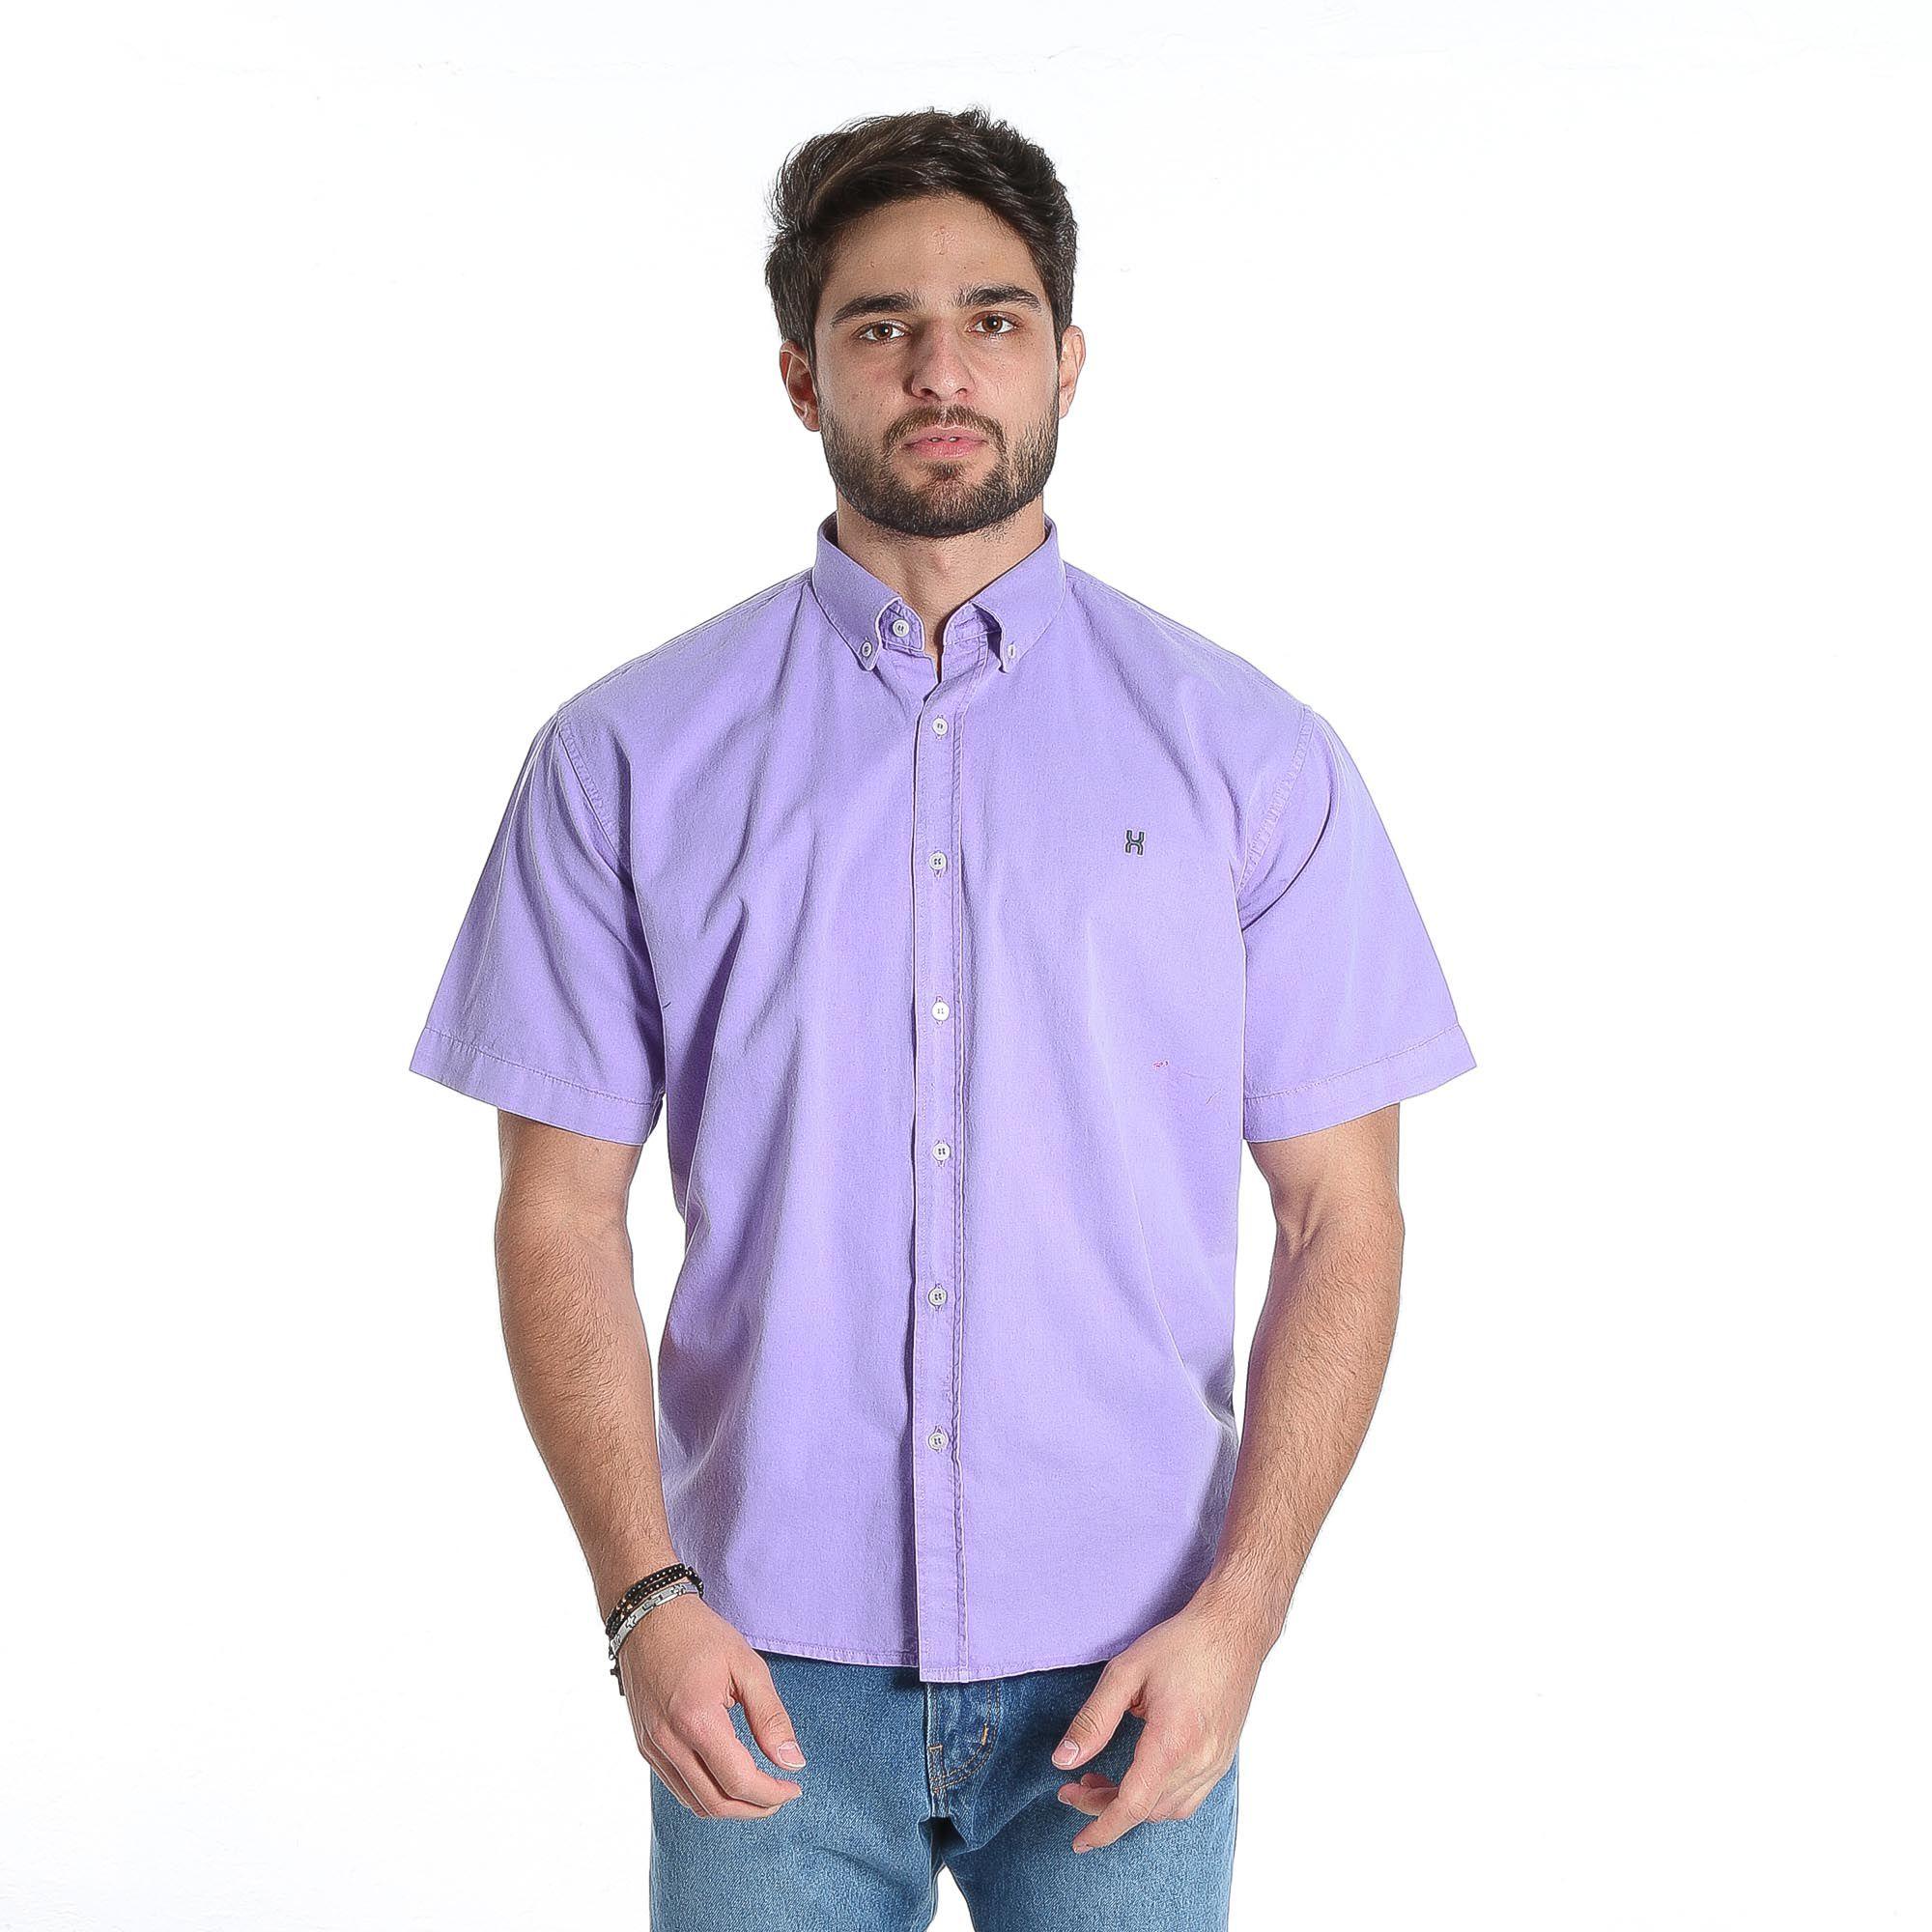 Camisa Masculina TXC 2373